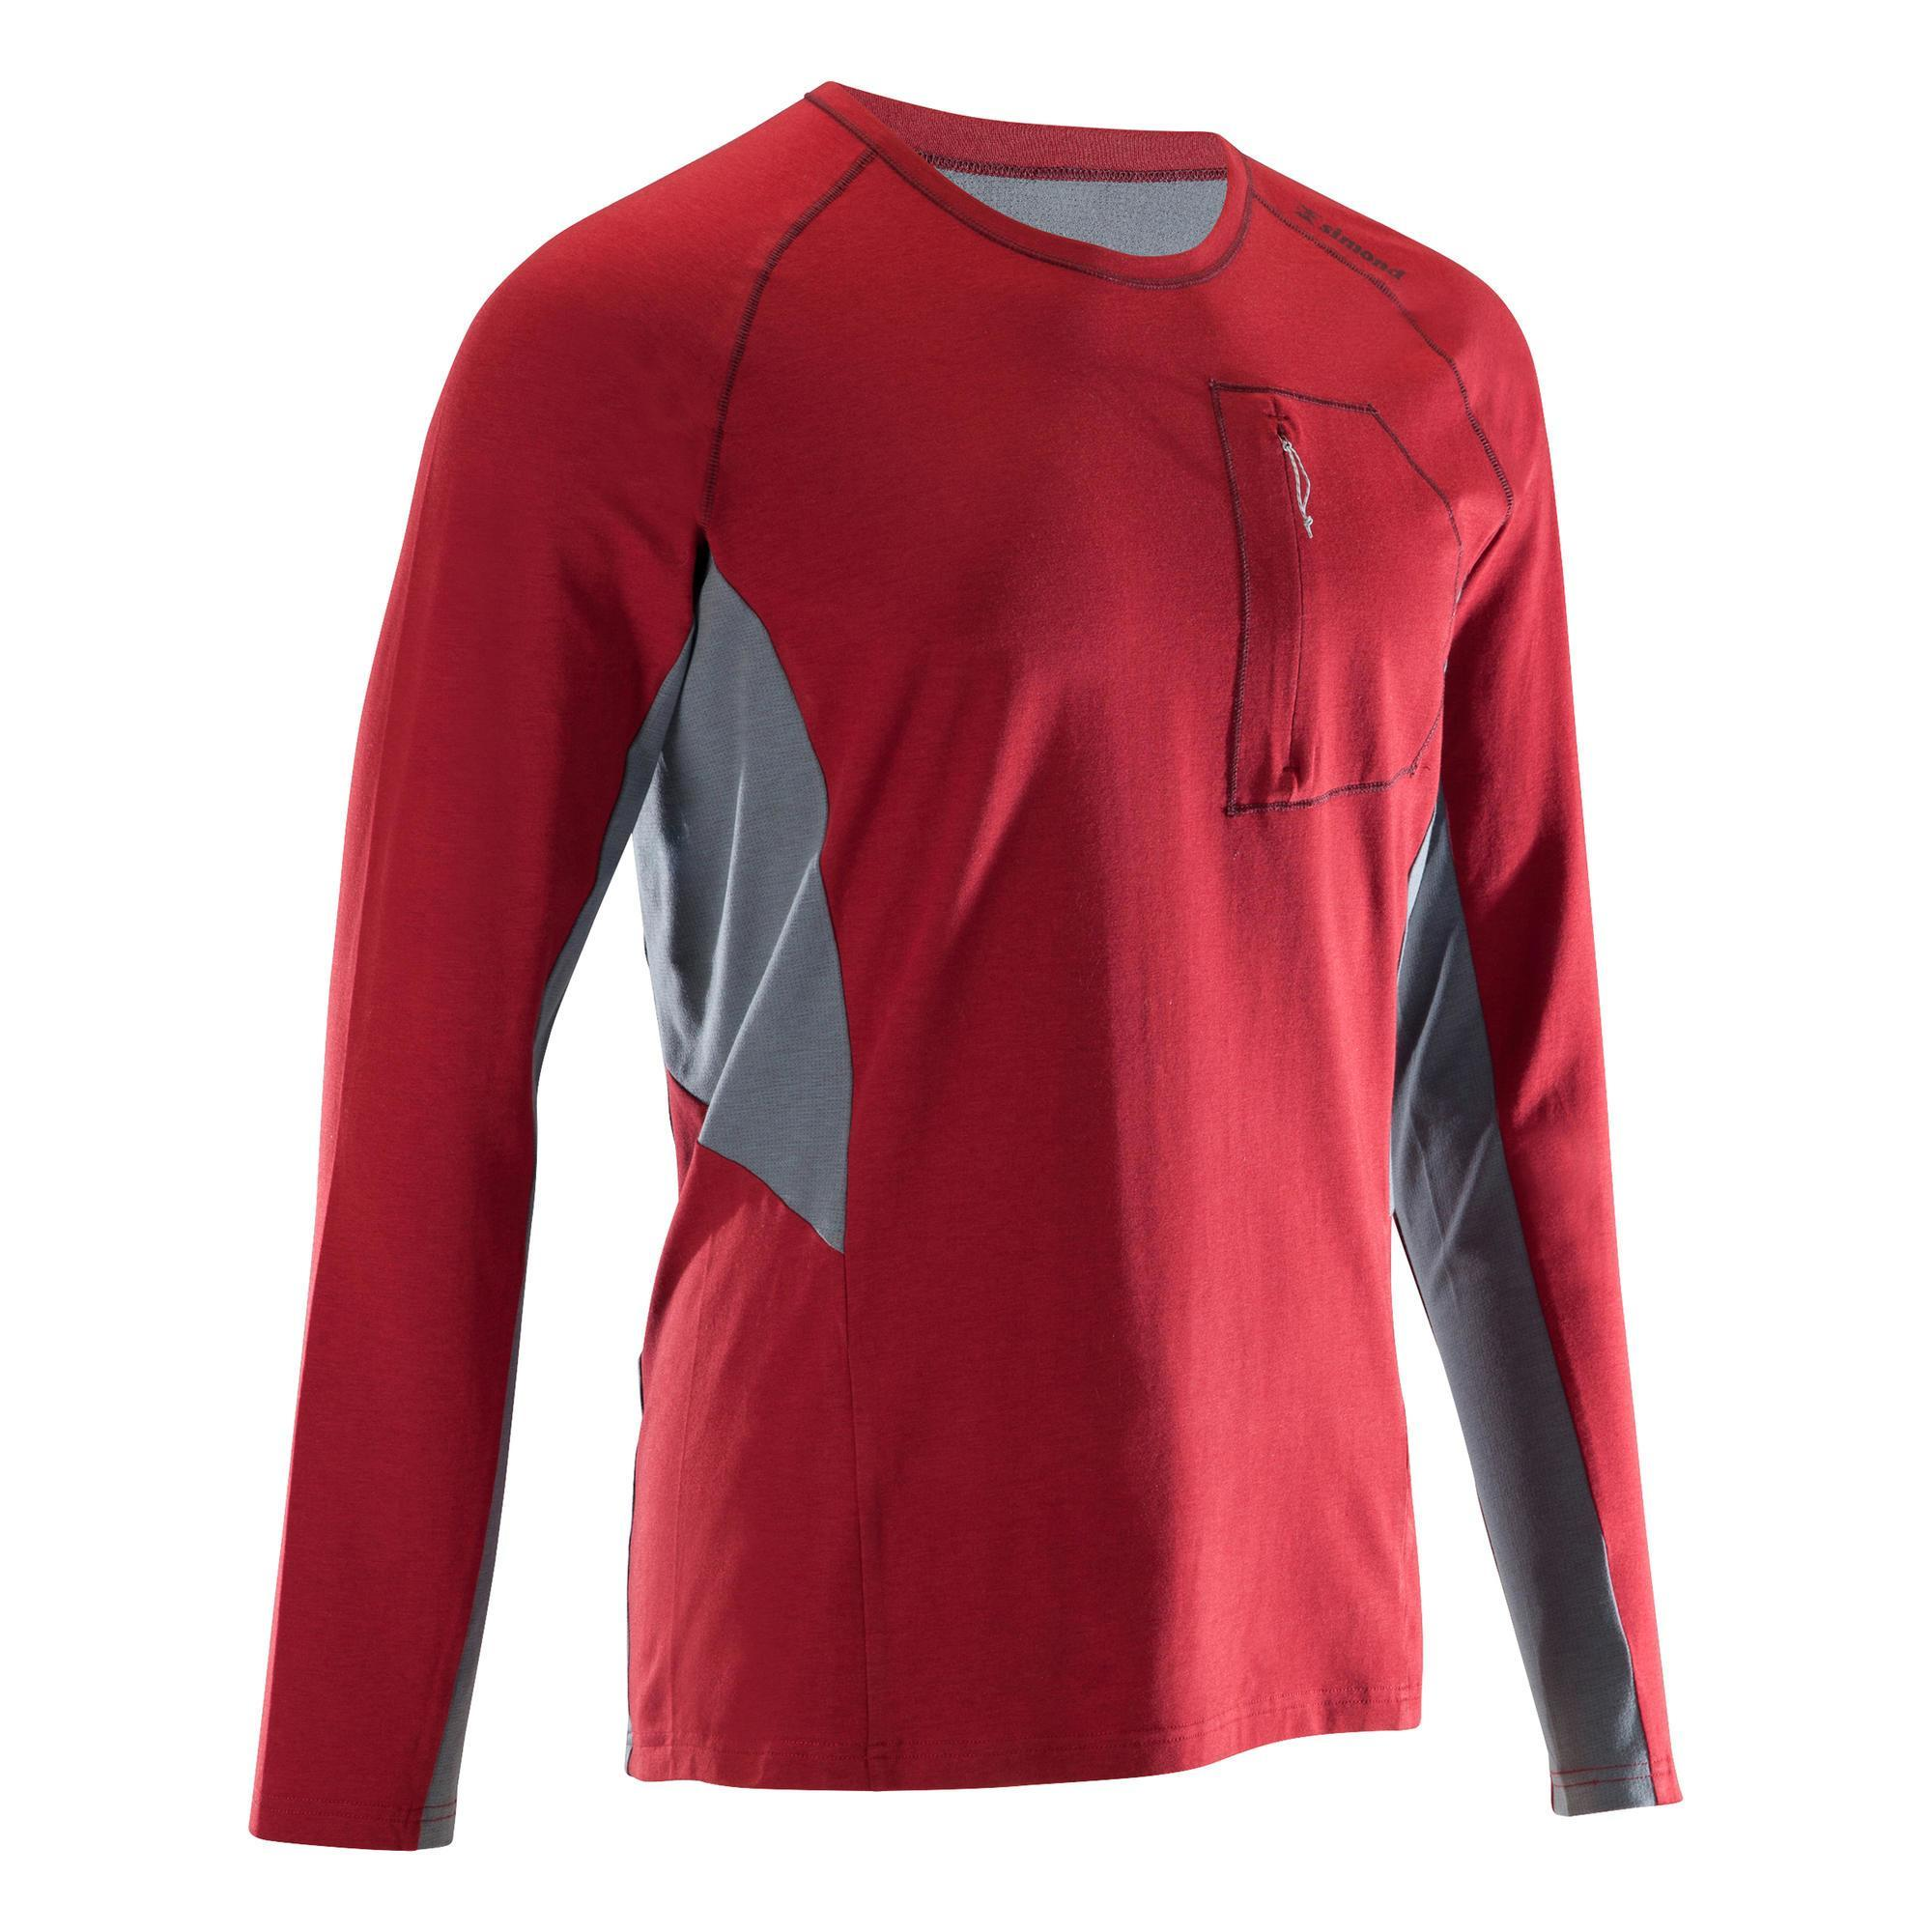 Klettershirt langarm Herren bordeauxrot | Sportbekleidung > Sportshirts > Klettershirts | Simond